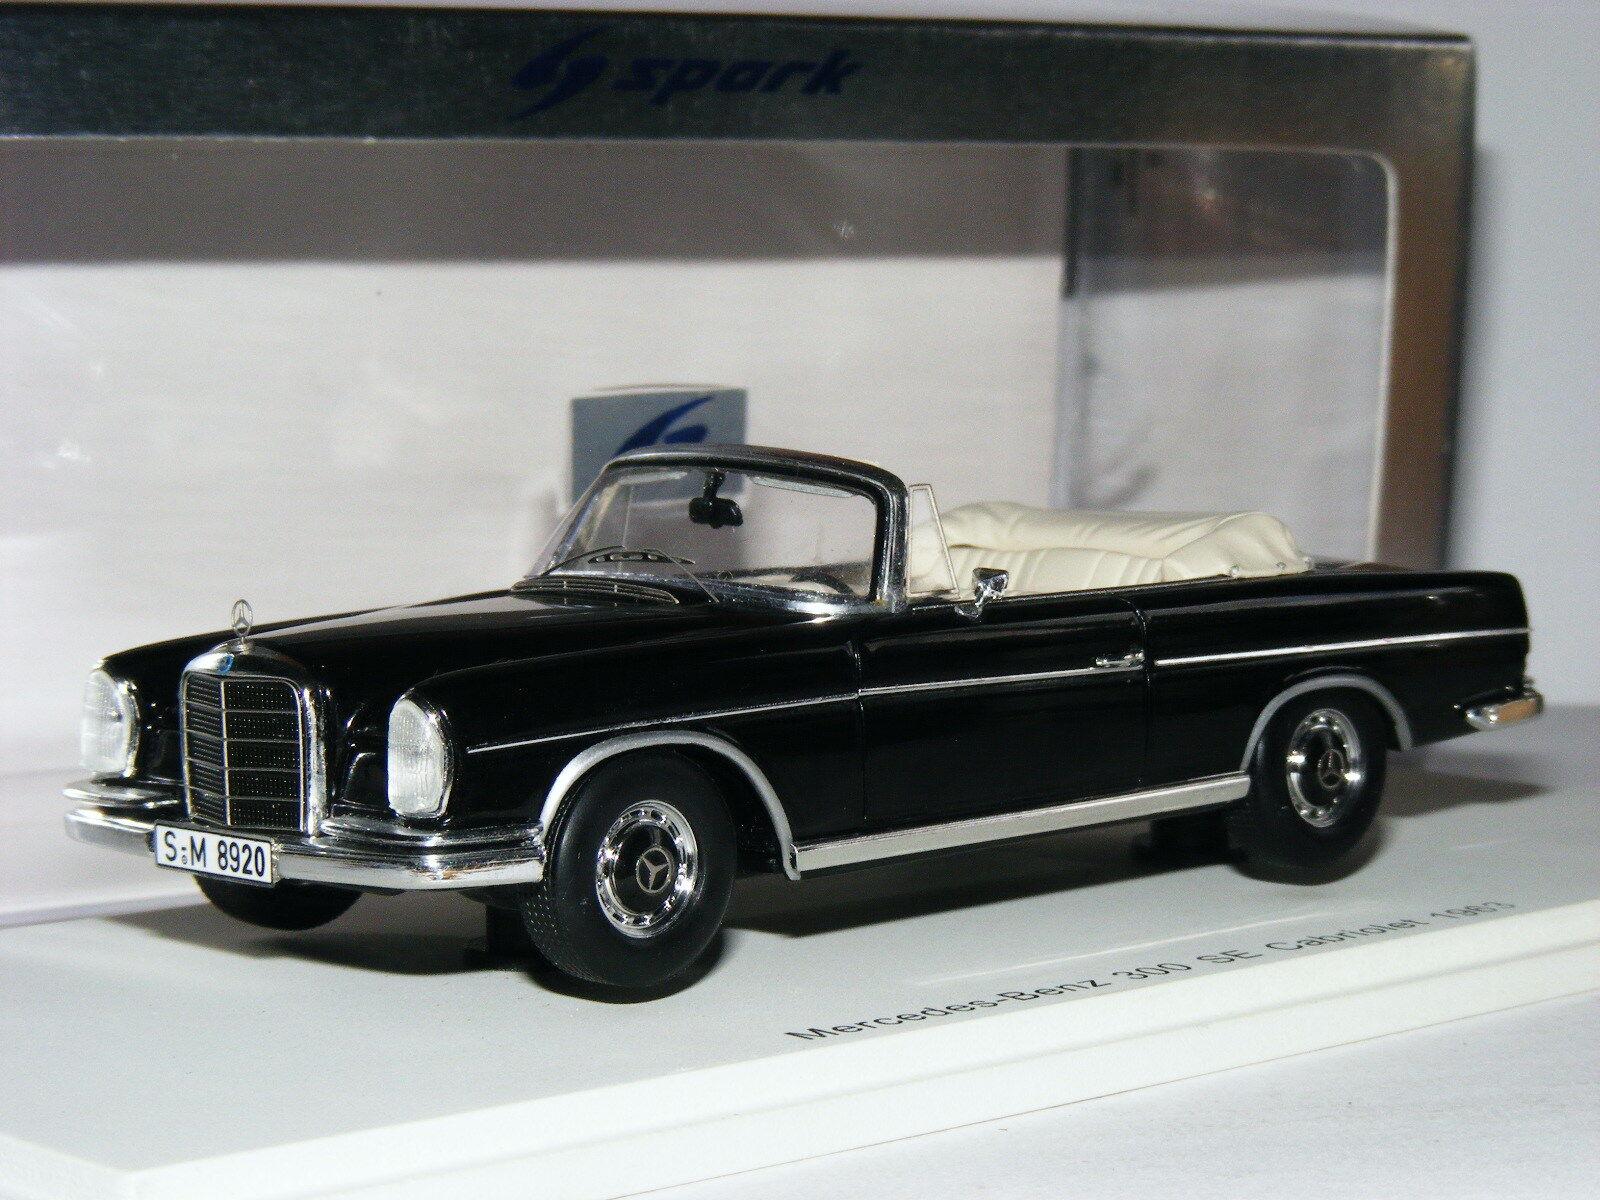 Spark S1061 S1061 S1061 1963 Mercedes-Benz W112 300 se Cabrio Negro 1 43 c4956a